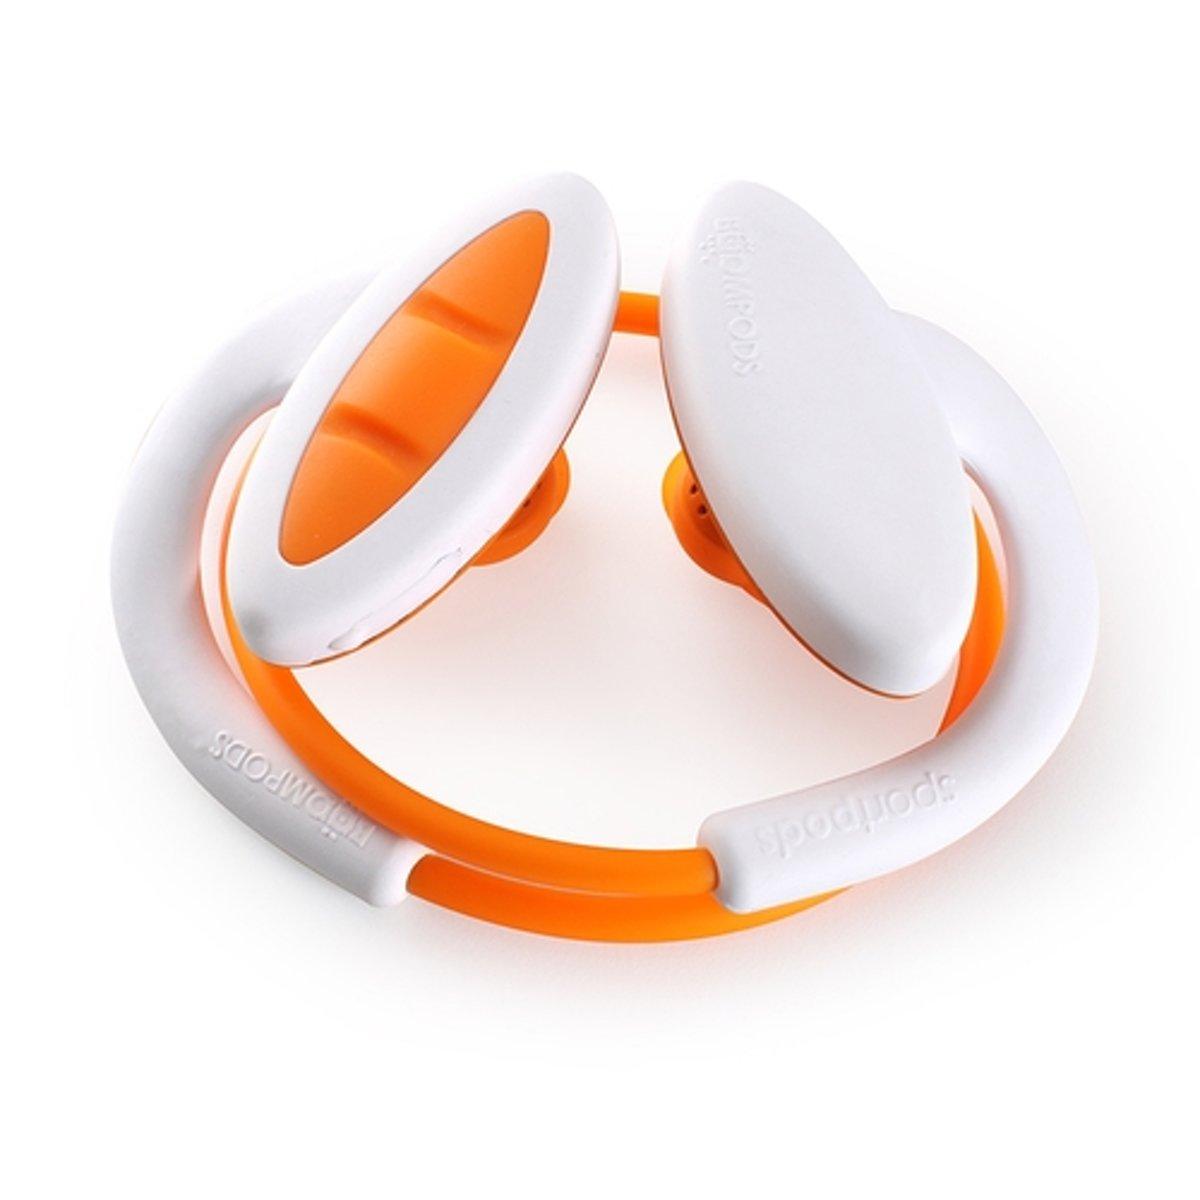 Boompods Sportpods 2 wit/oranje kopen